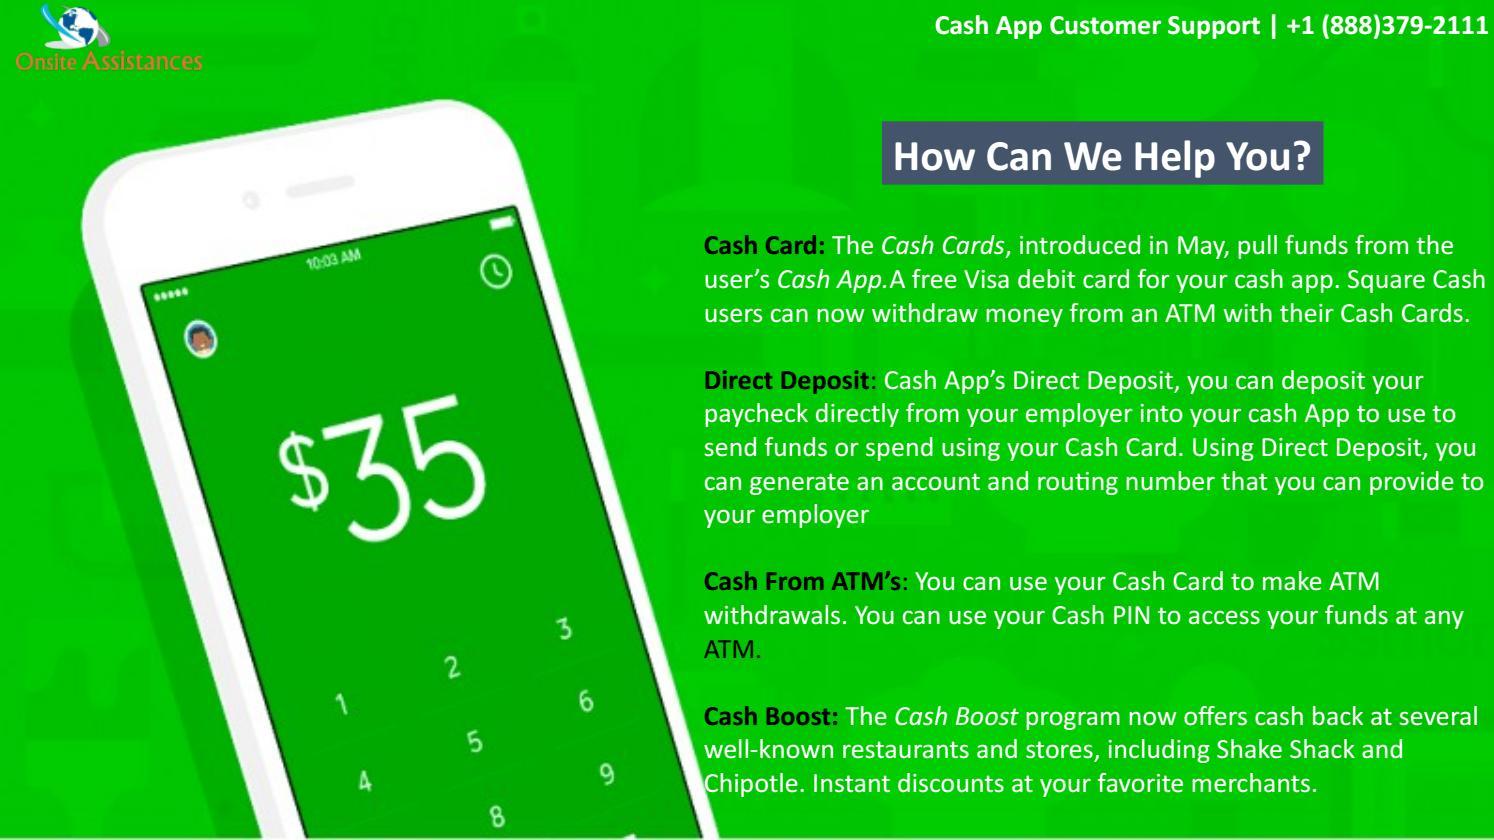 cash app customer service +1888-379-2111 cash app support number by